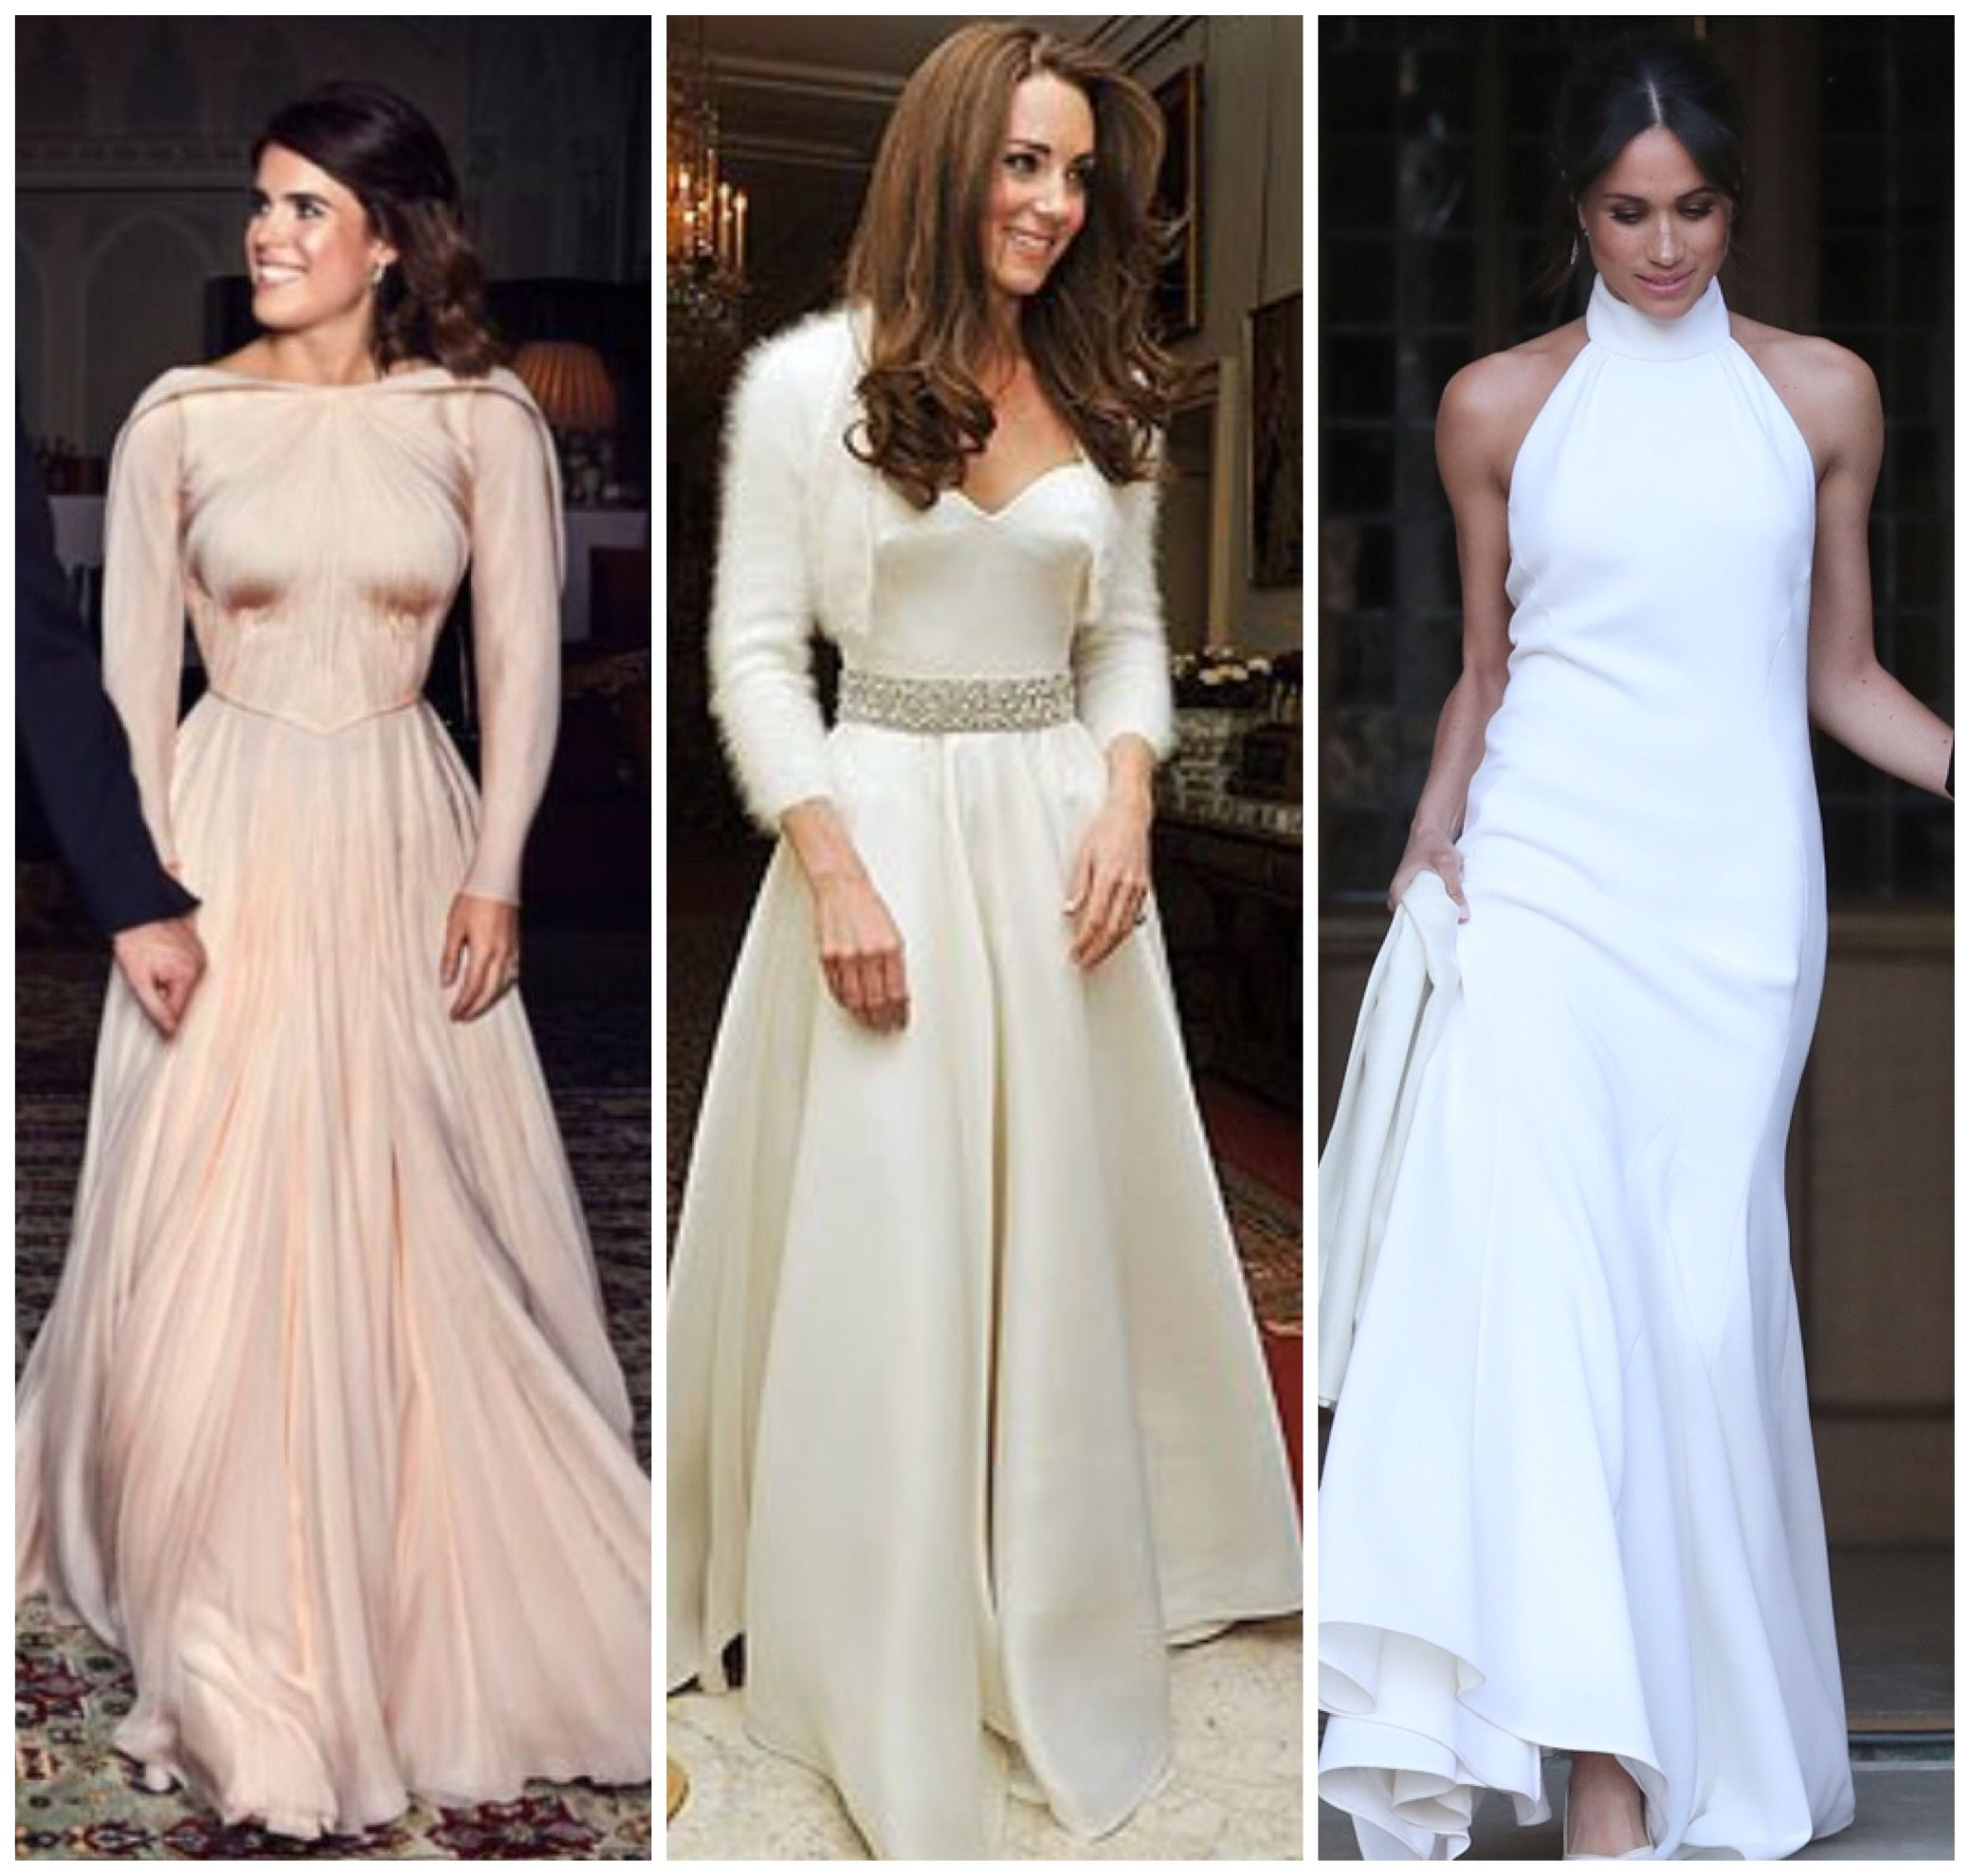 3 Royal Second Wedding Dresses Famous Wedding Dresses Royal